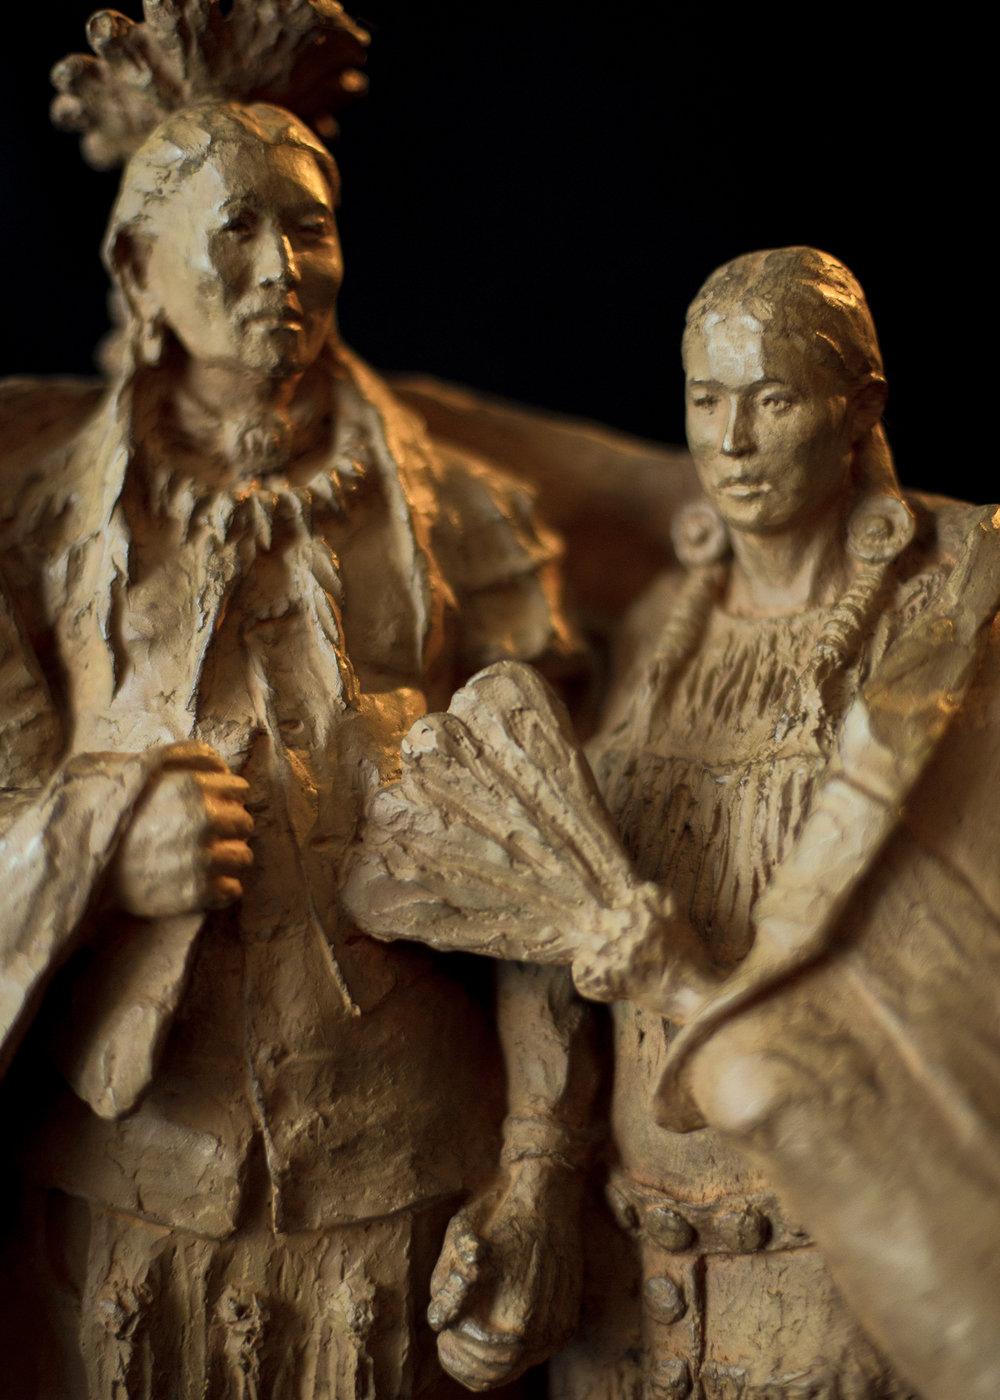 "The Wedding Blanket | 20"" x 13.5"" x 9.75"" | Bronze | $5,400 | Edition of 30"